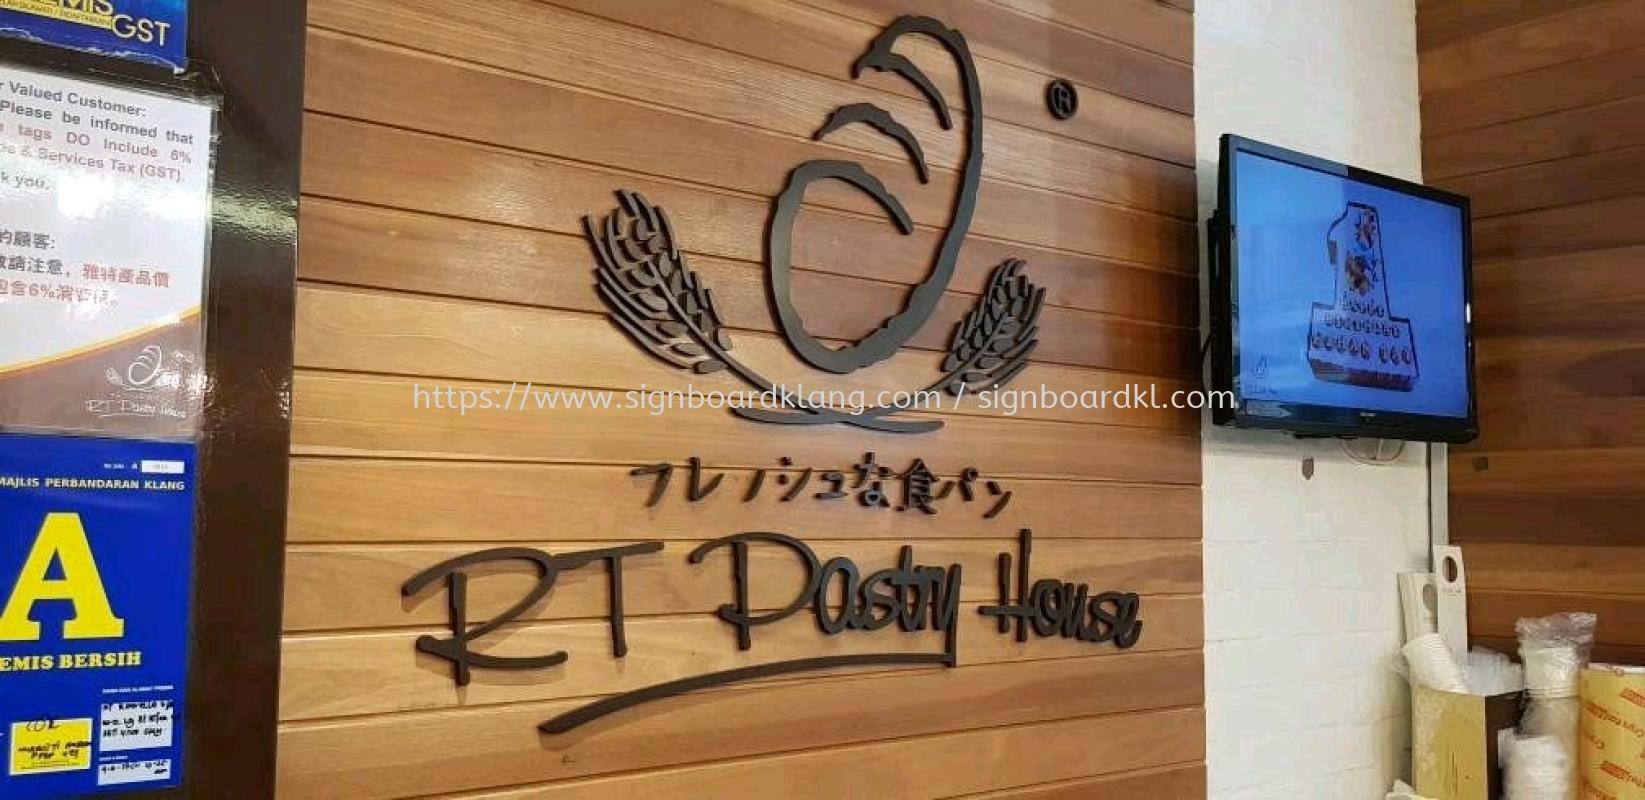 Miraculous Rt Pastry House 3D Pvc Box Up Signboard Klang Pvc Board 3D Download Free Architecture Designs Lectubocepmadebymaigaardcom